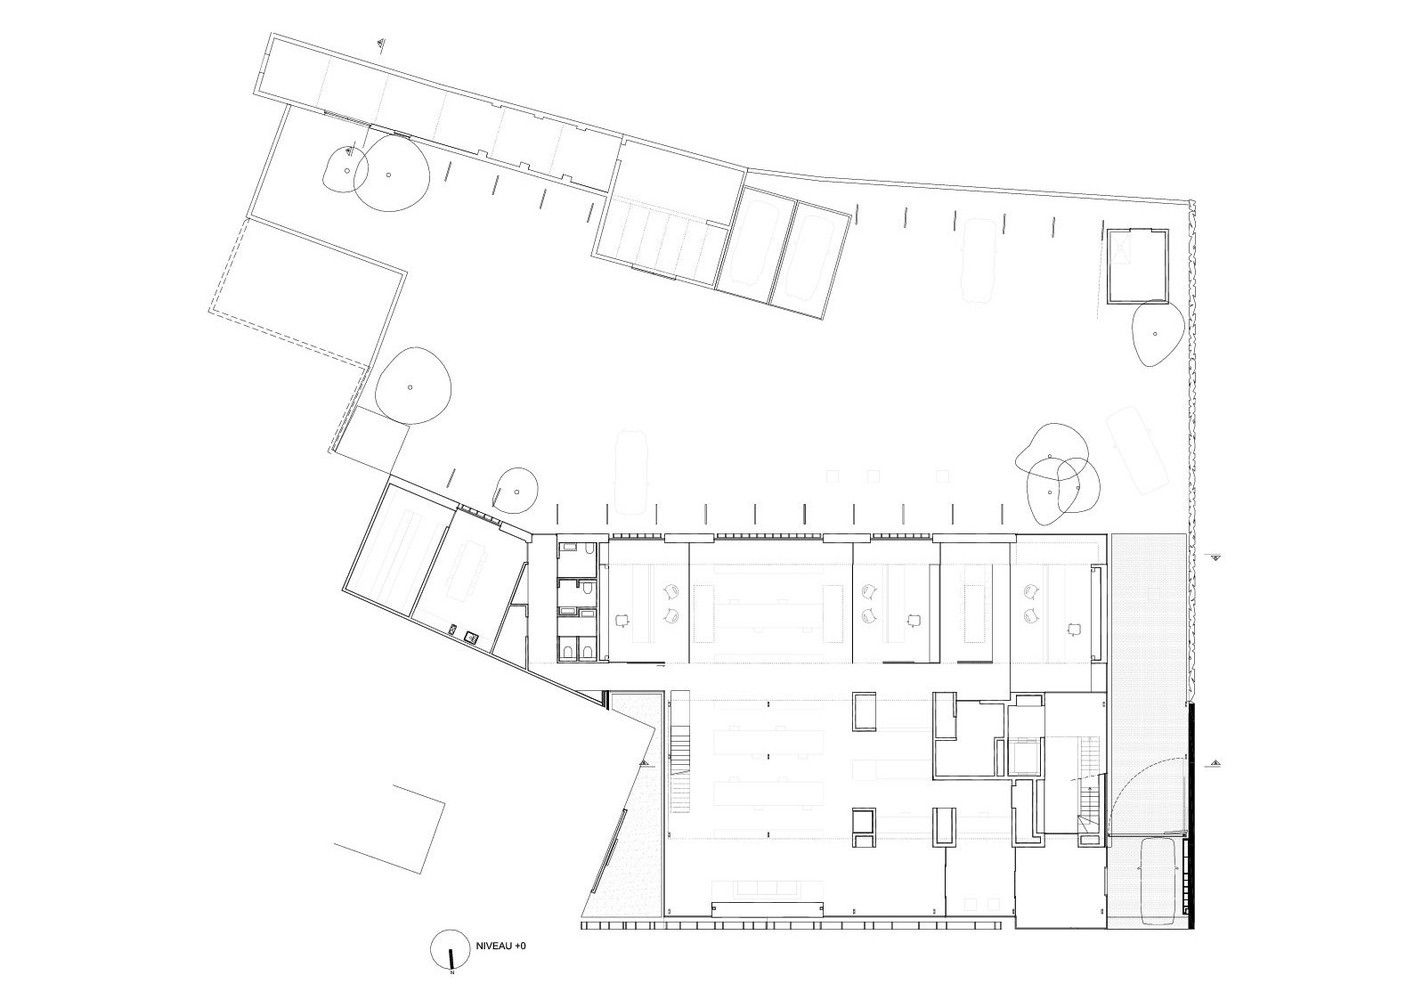 Gallery Of Office Solvas Graux Amp Baeyens Architecten